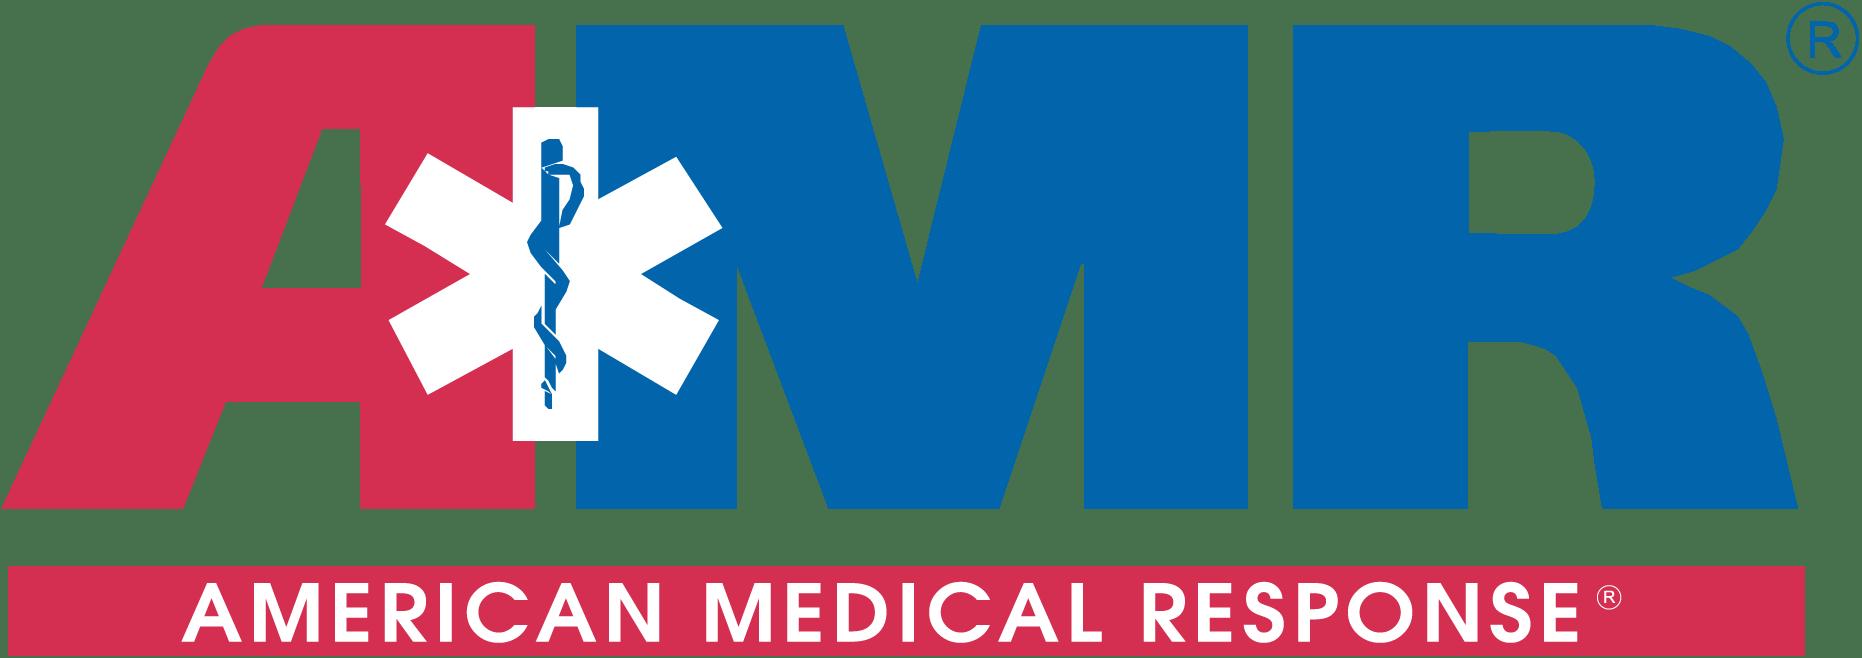 American-Medical-Response-Logo-NEW-big